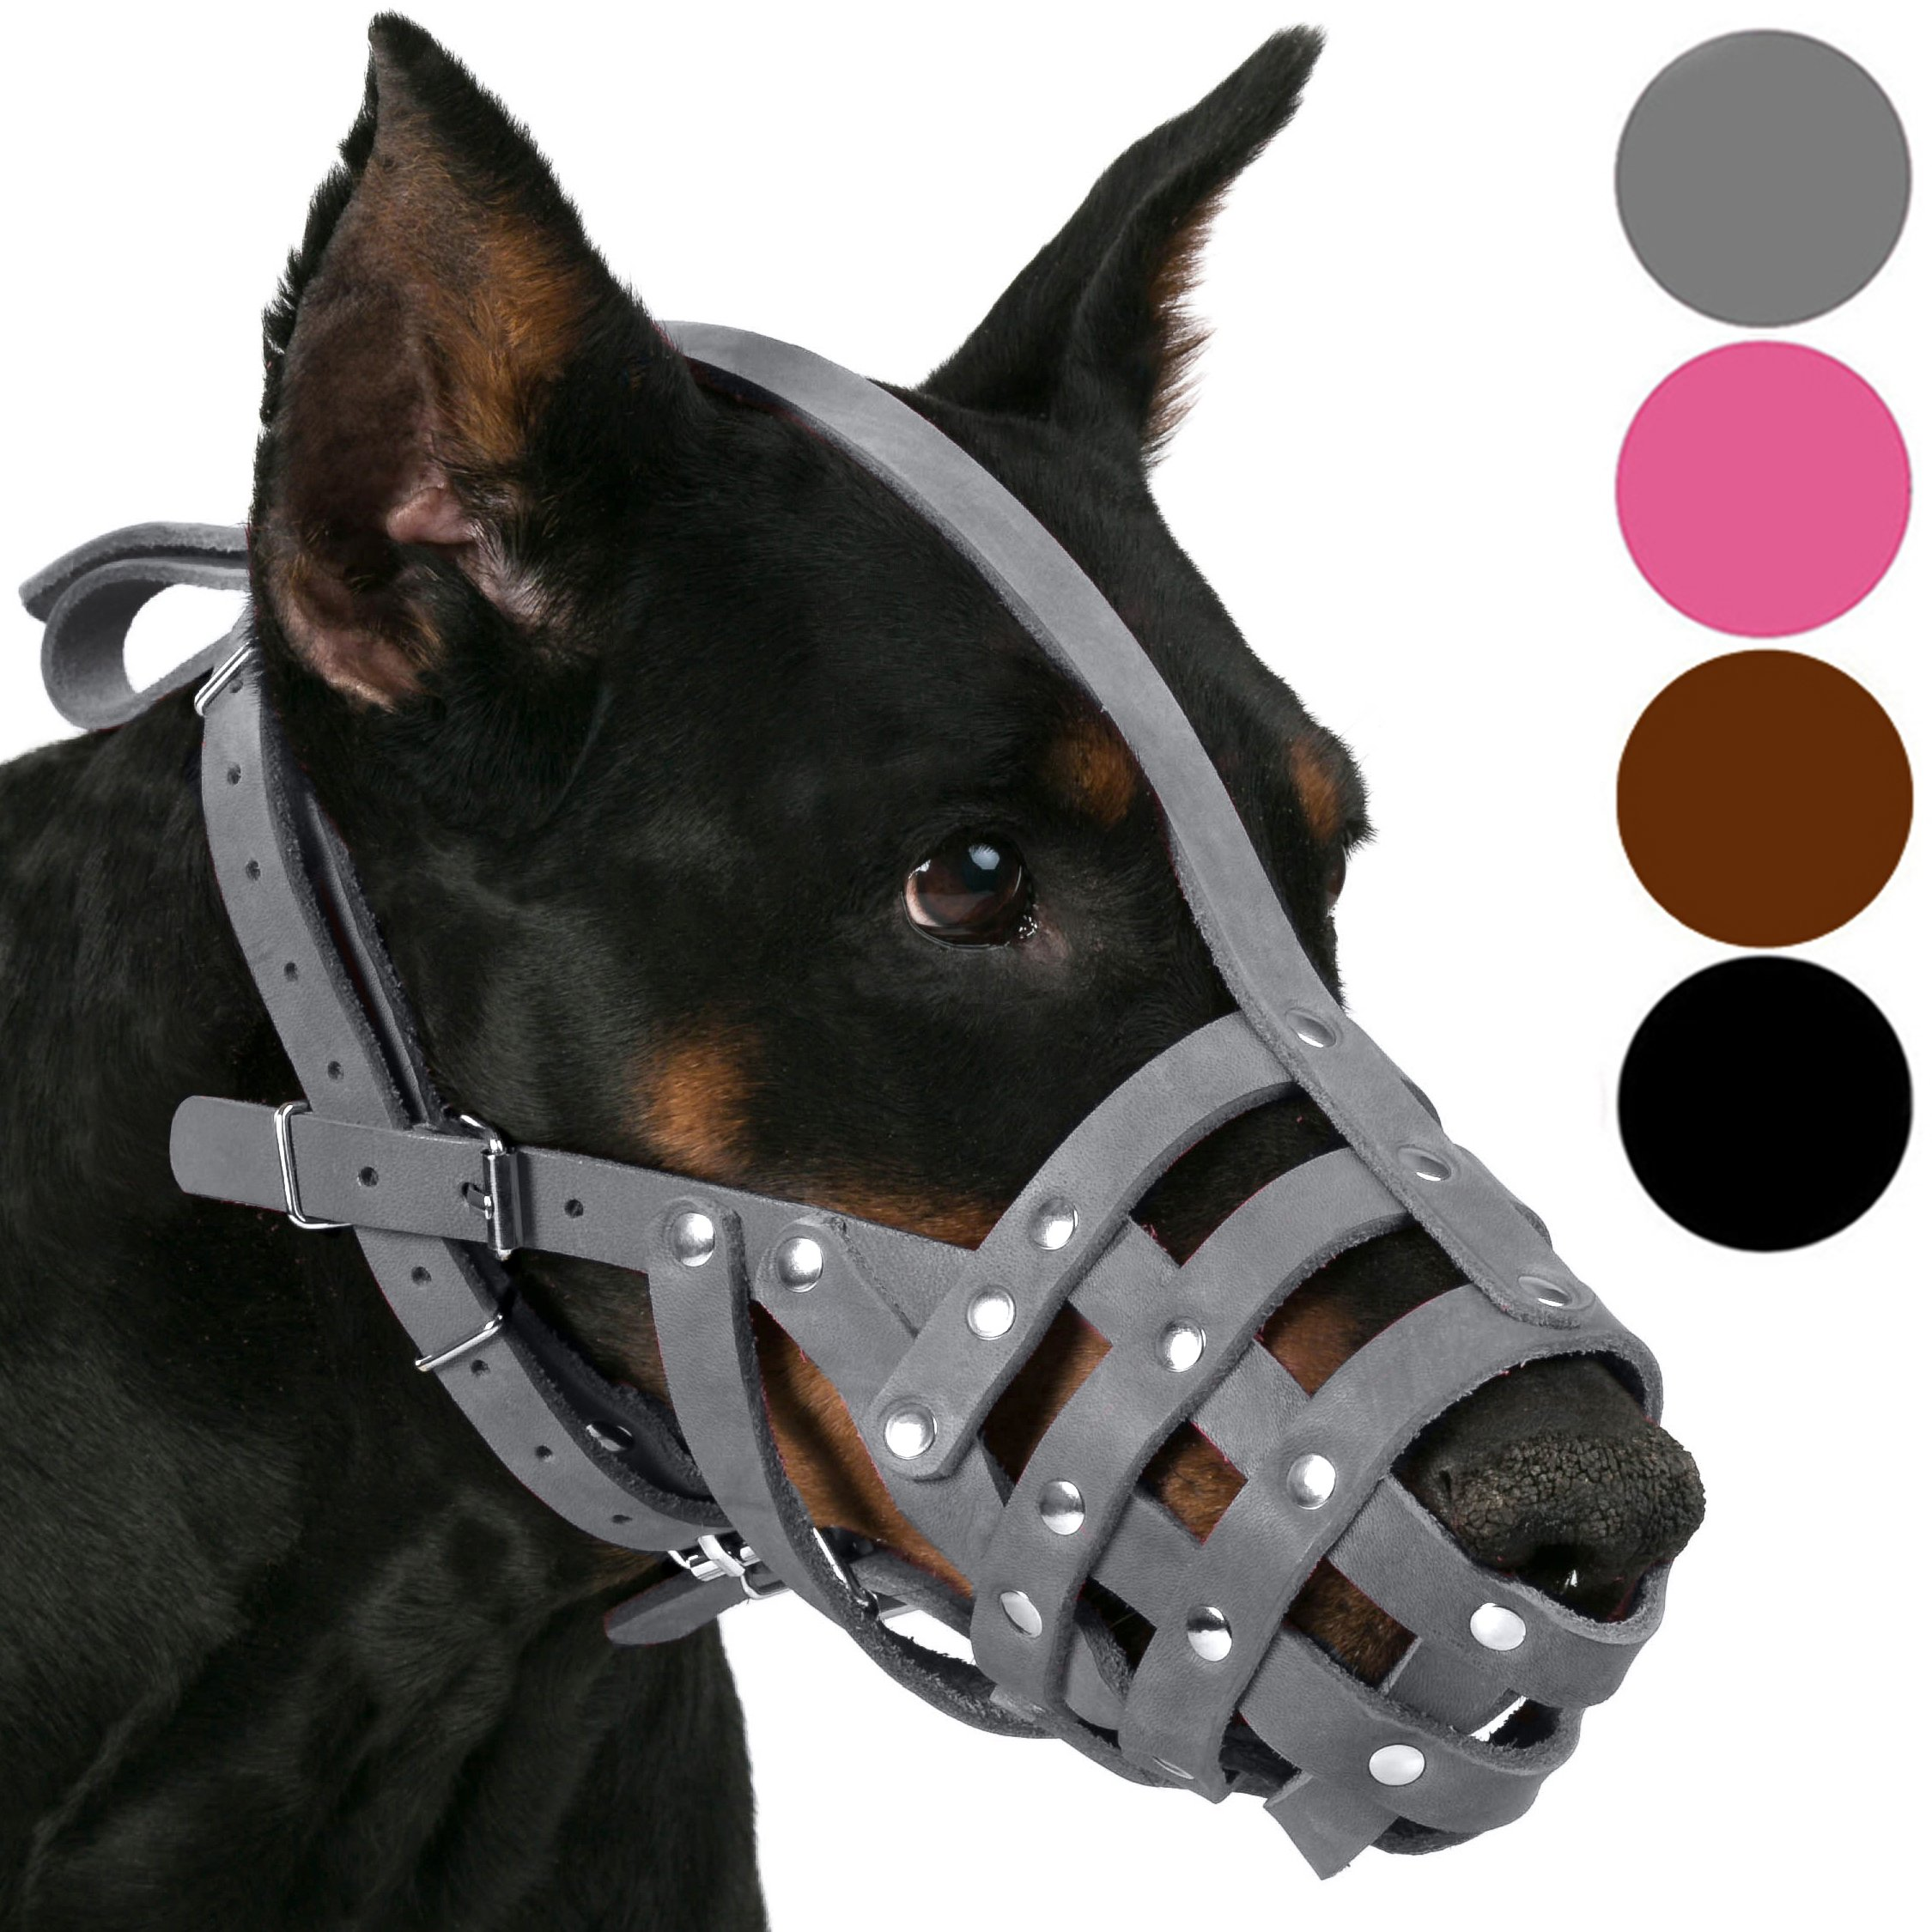 CollarDirect Leather Dog Muzzle Doberman German Shepherd Dalmatian Setter Basket Medium Large Breeds Pink Gray (L, Black)